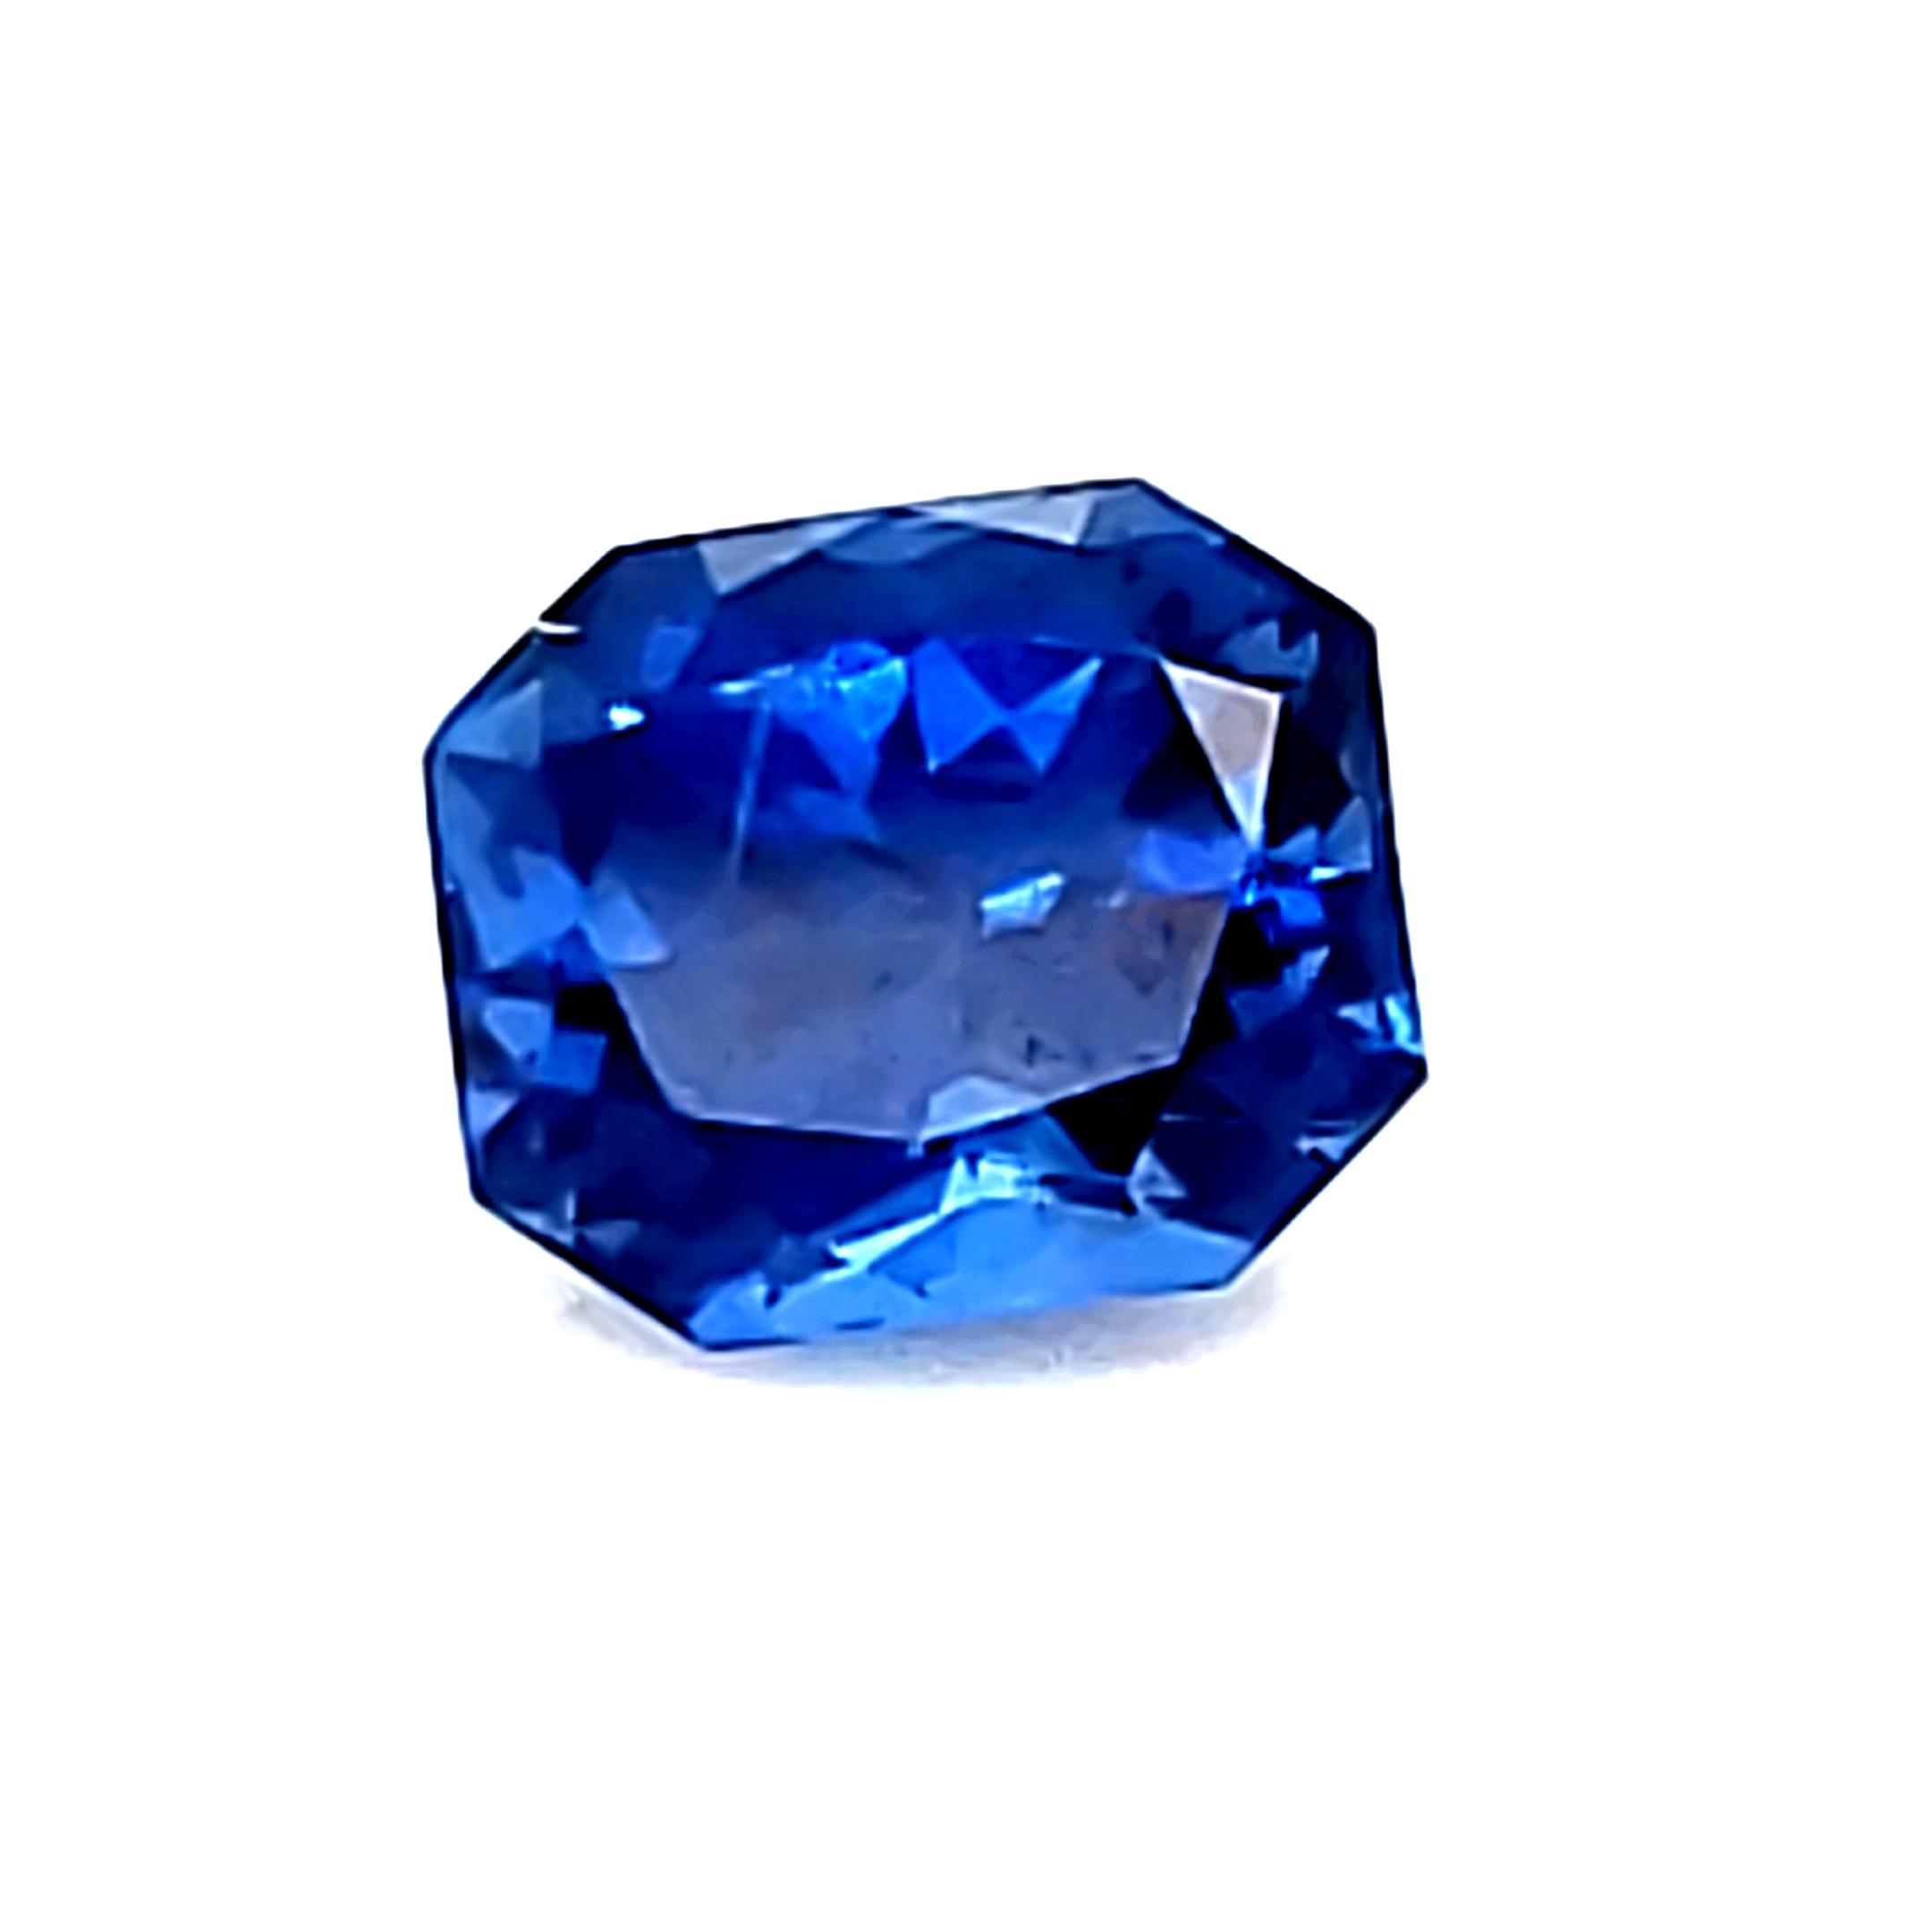 1.51 ct. Sapphire